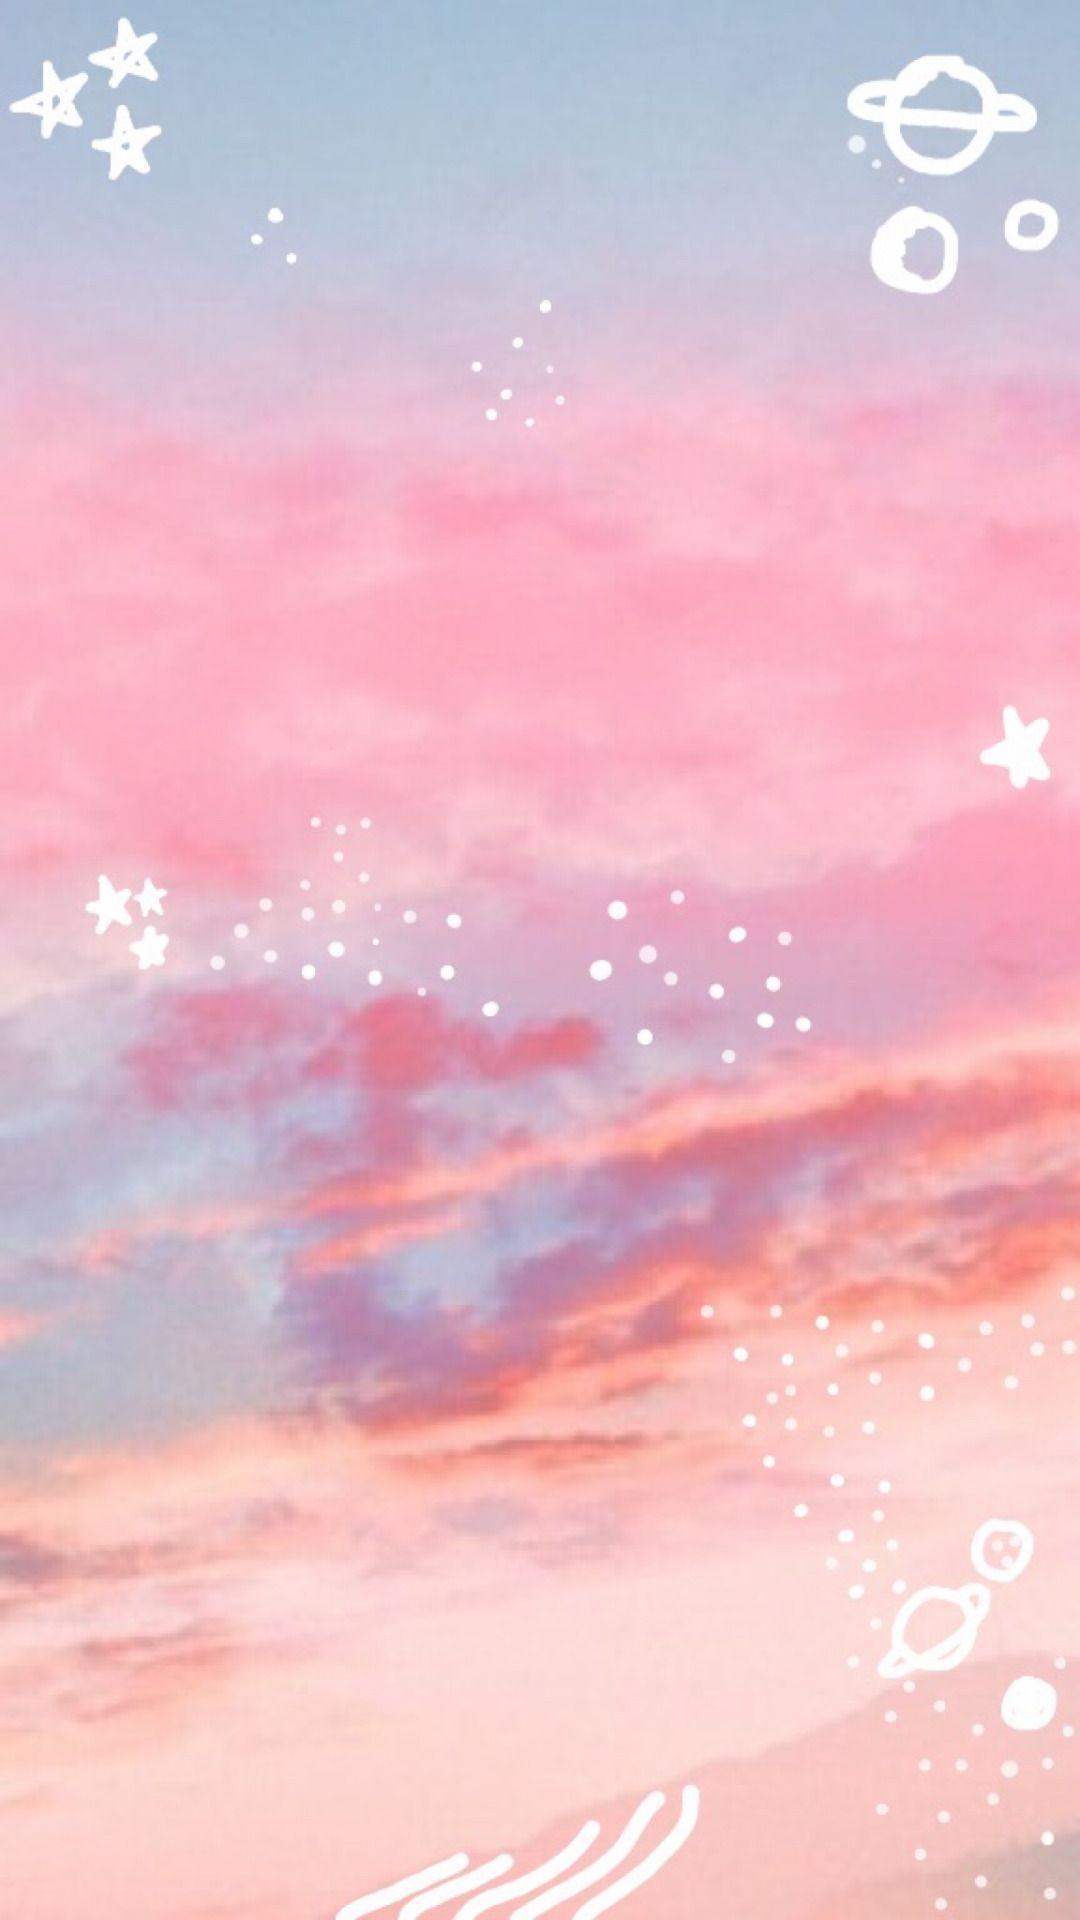 Sugar Pink Pastel Aesthetic Wallpapers Top Free Sugar Pink Pastel Aesthetic Backgrounds Wallpaperaccess